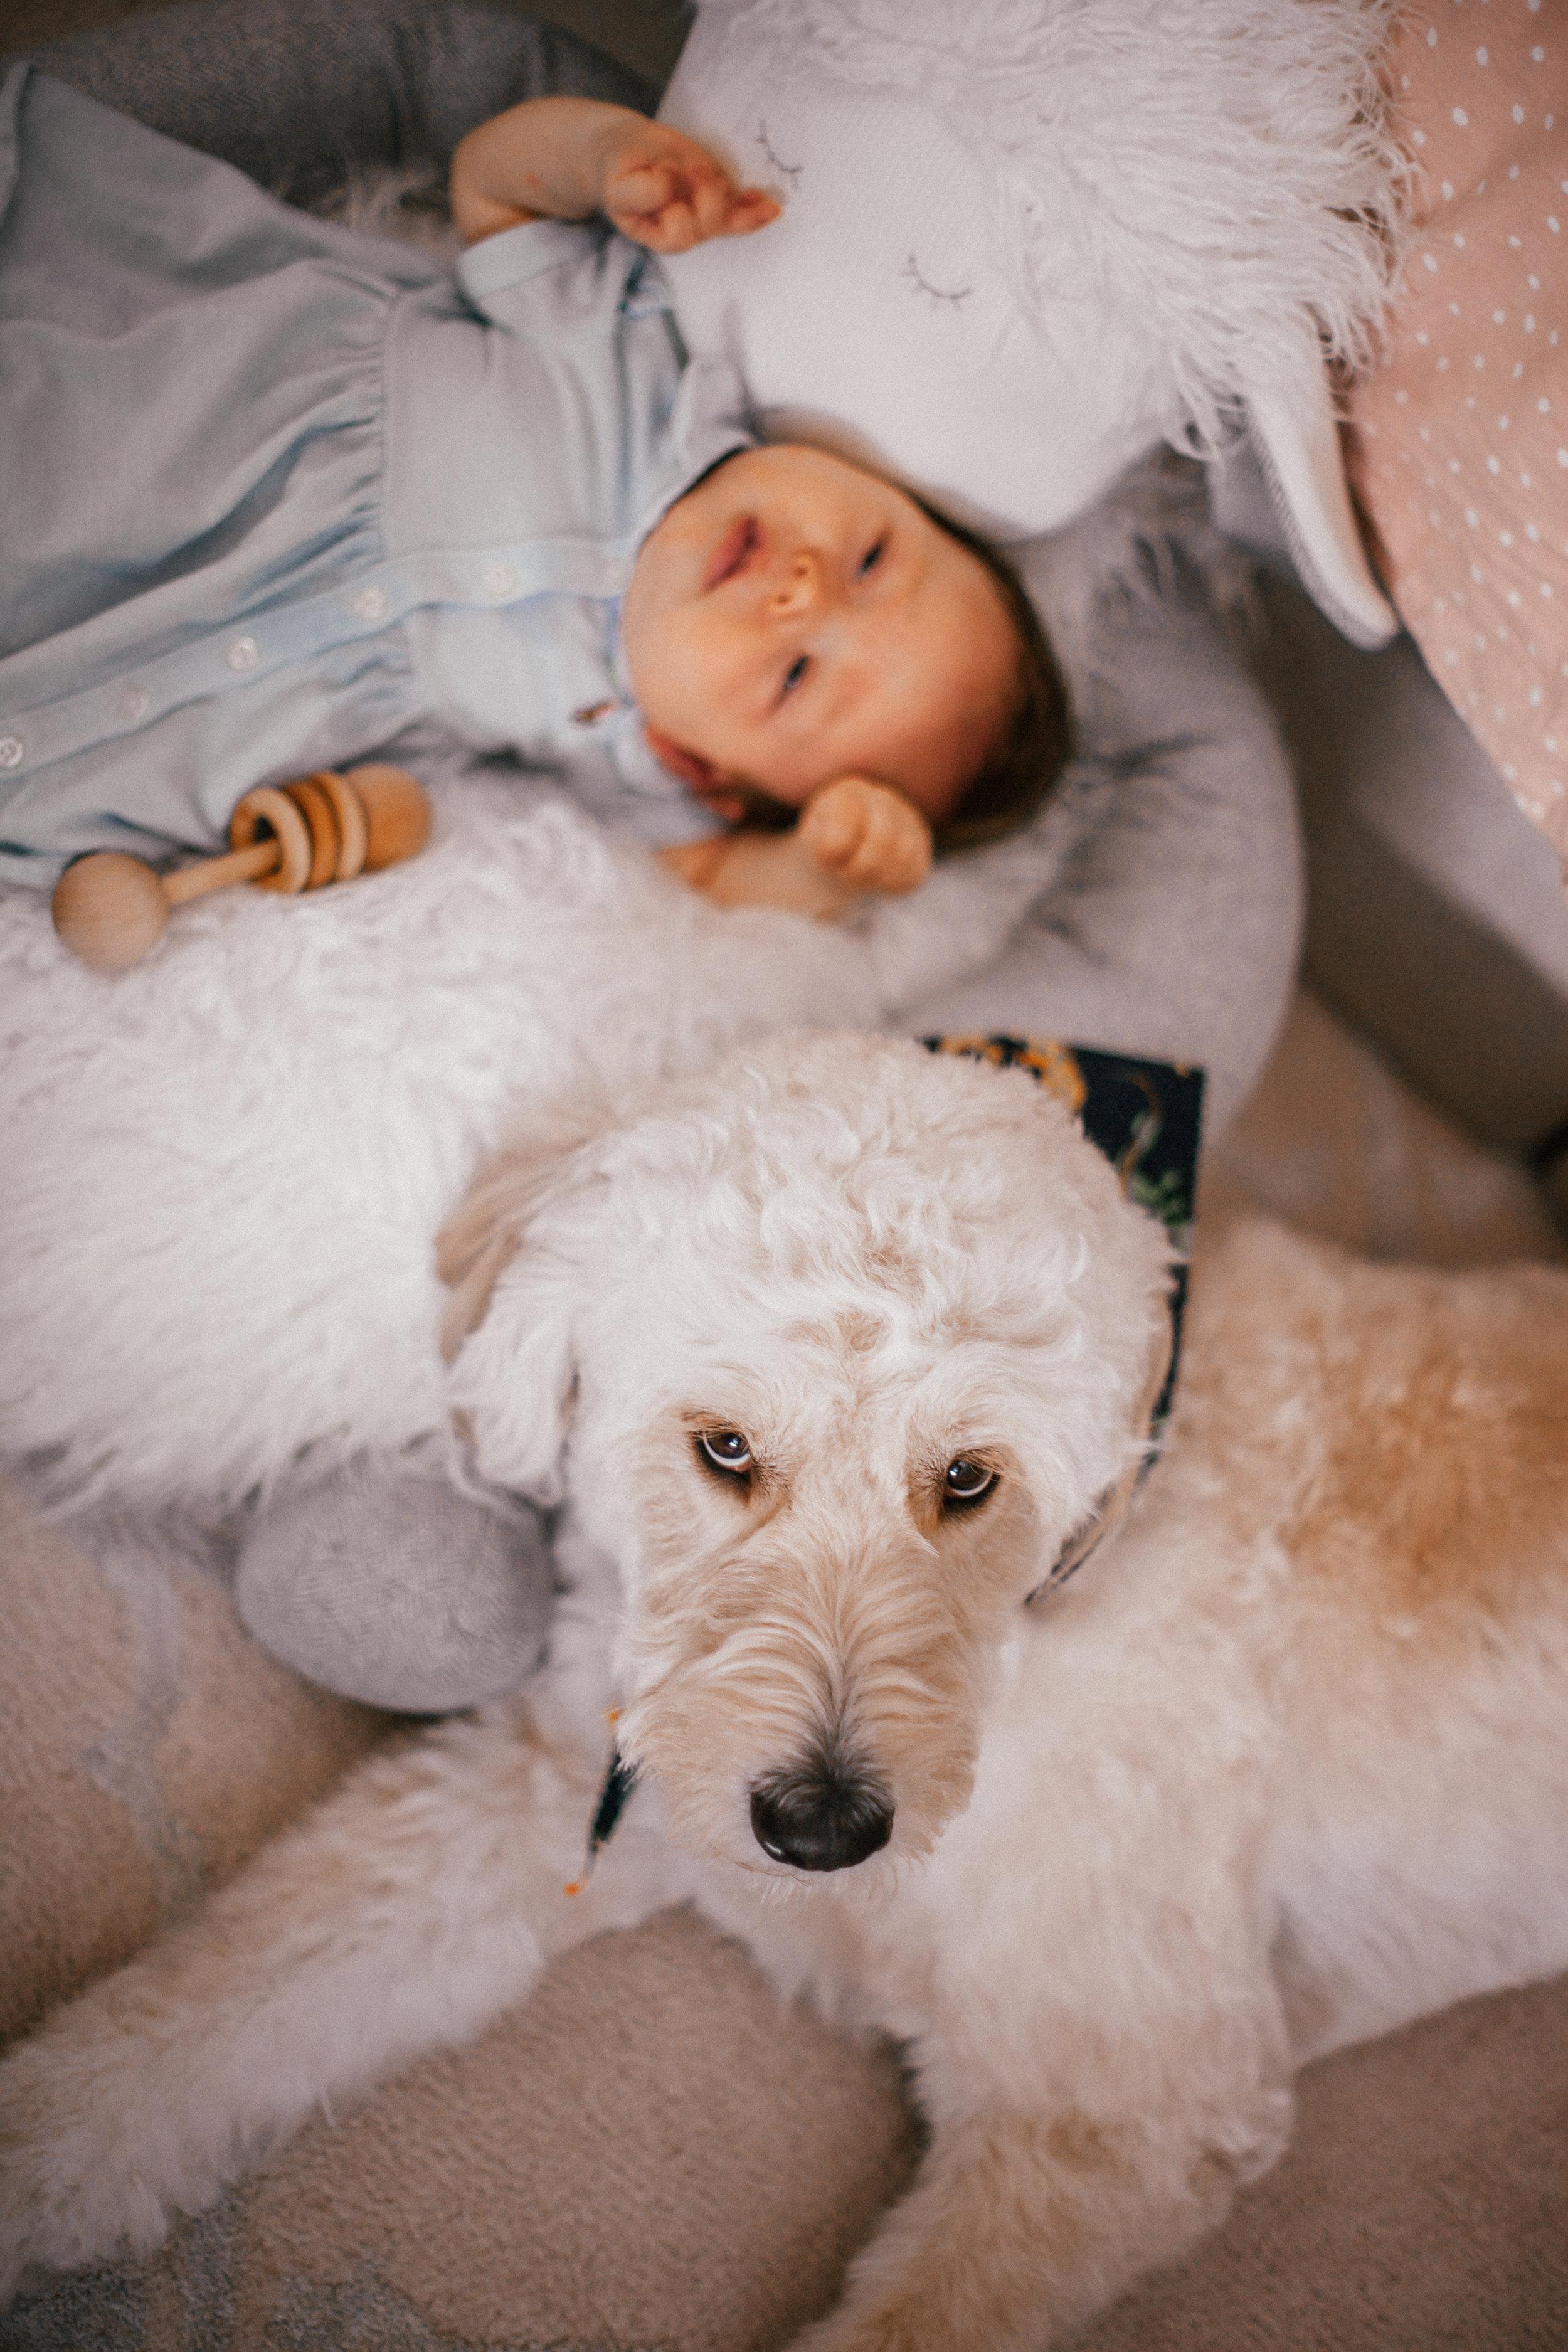 morningside-buckhead-atlanta-newborn-photography-angela-elliott-wingard-78.jpg